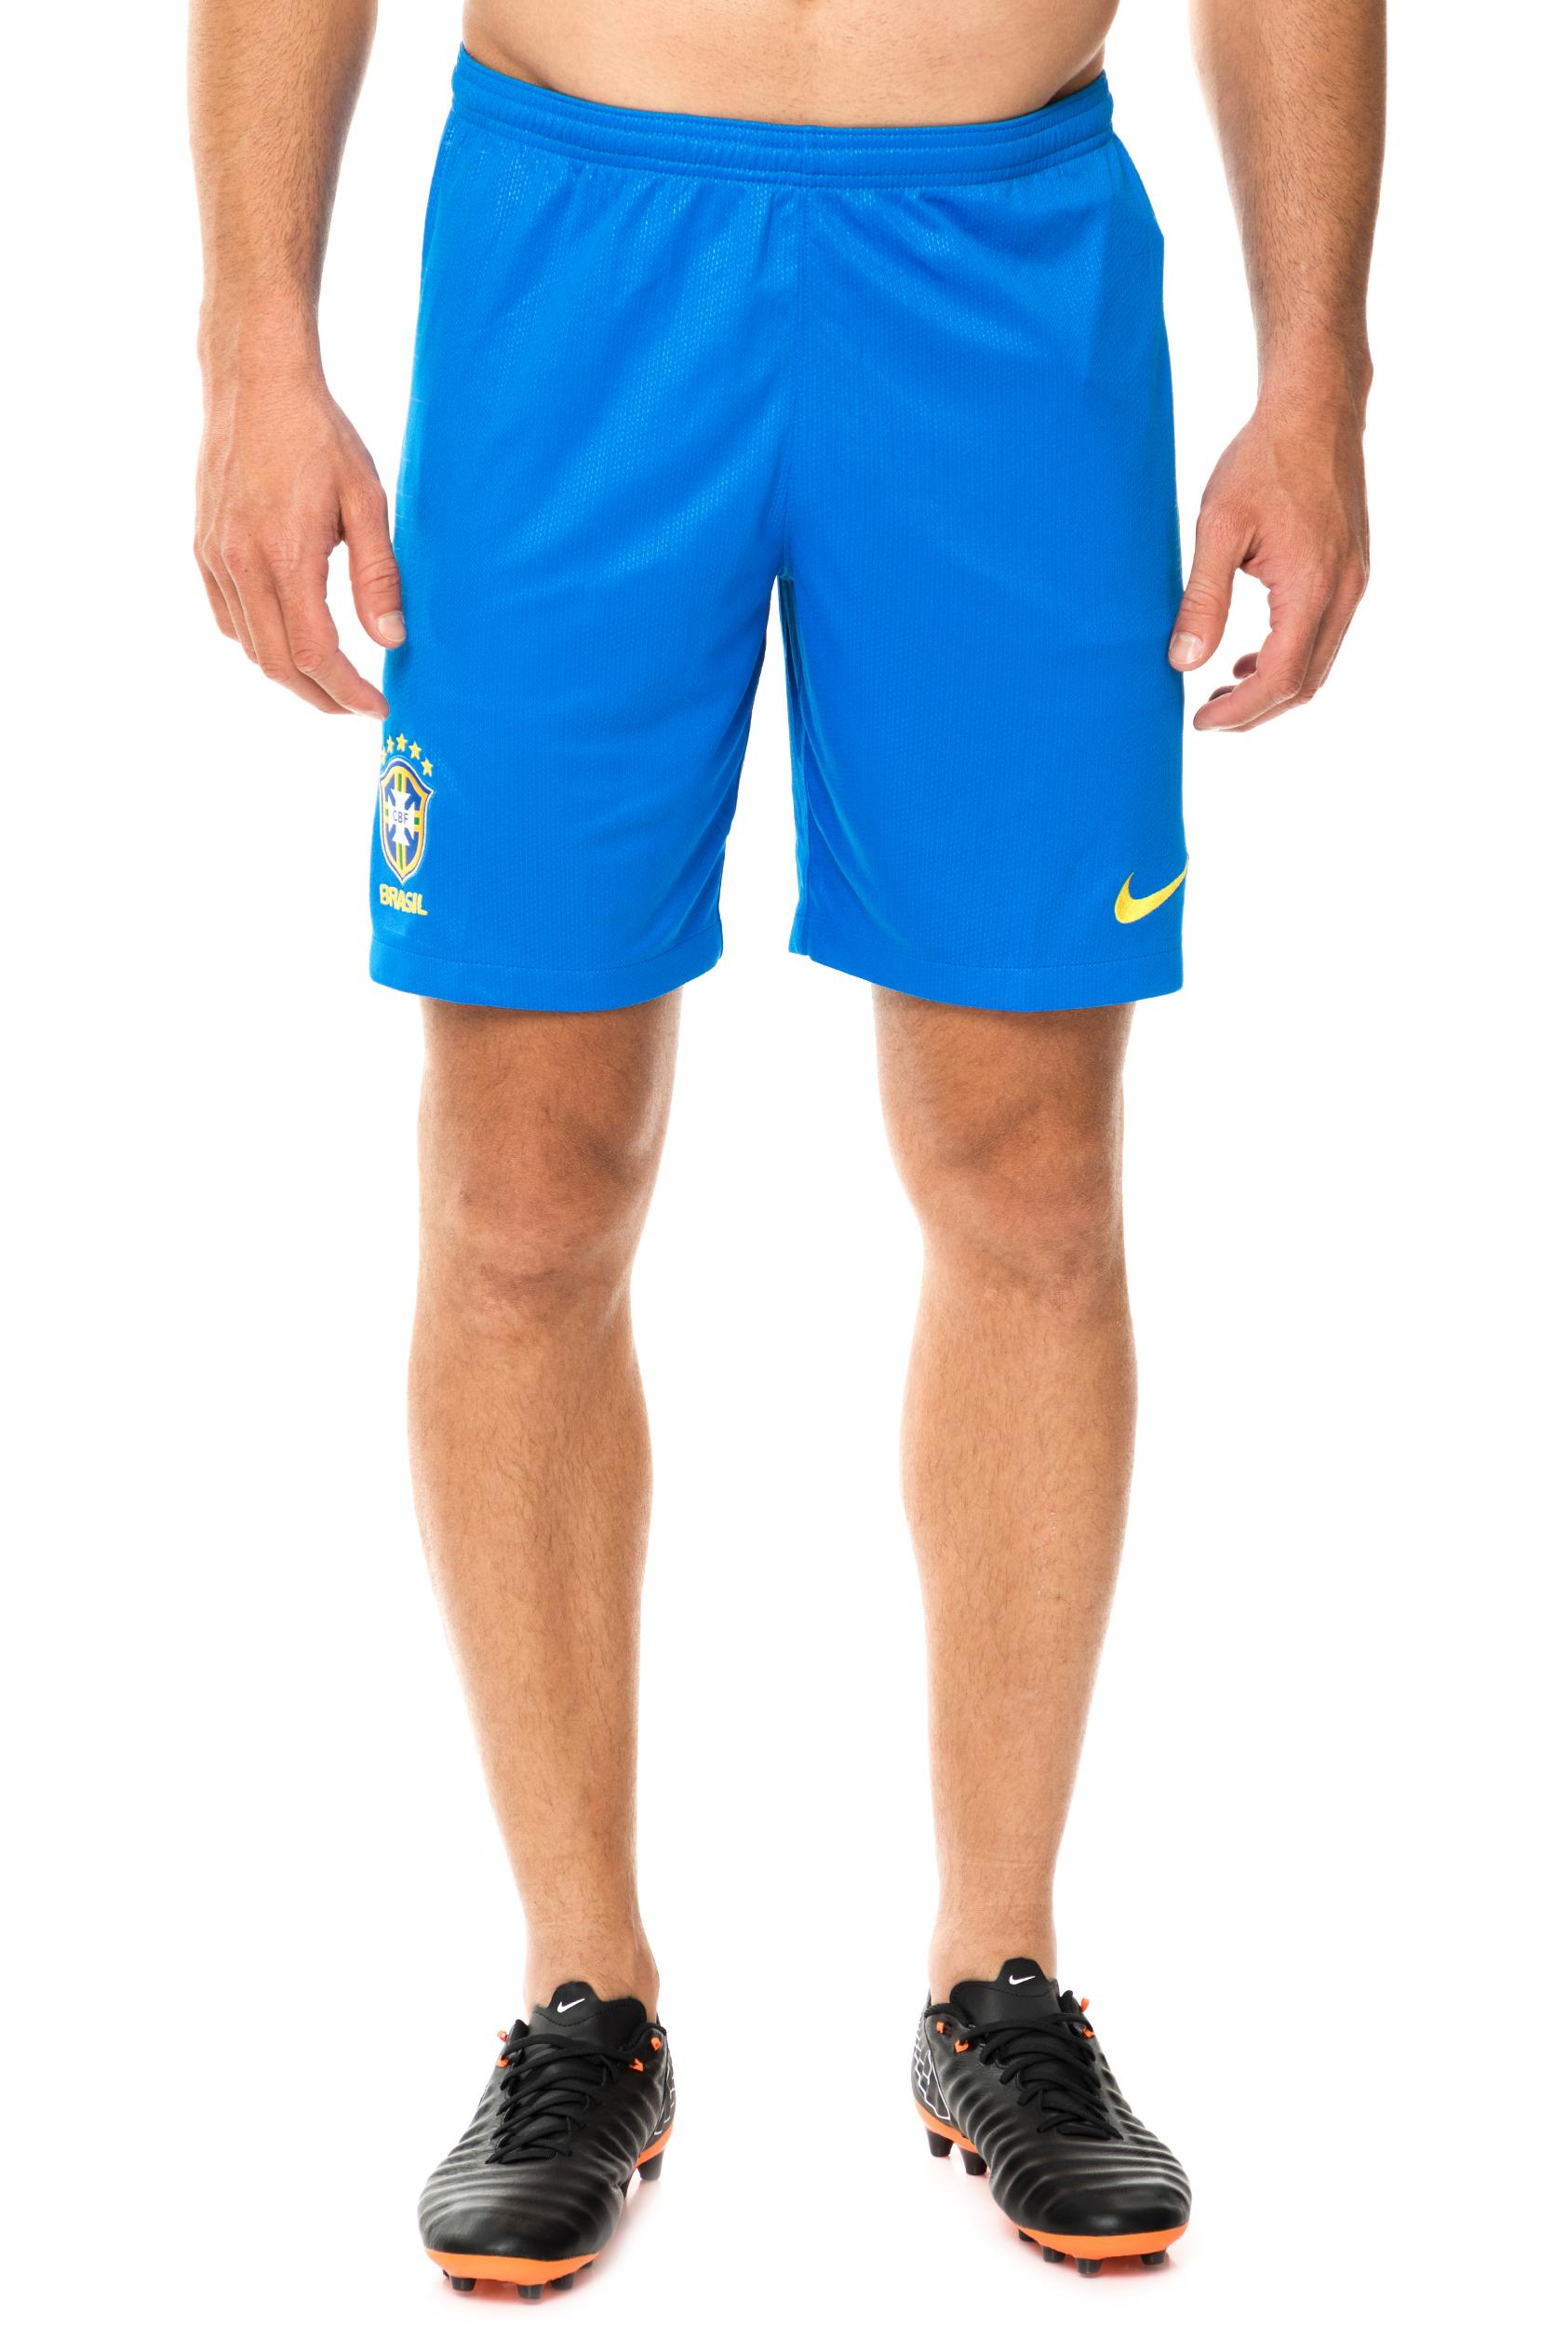 NIKE - Ανδρική βερμούδα ποδοσφαίρου CBF M NK BRT STAD SHORT HM γαλάζια